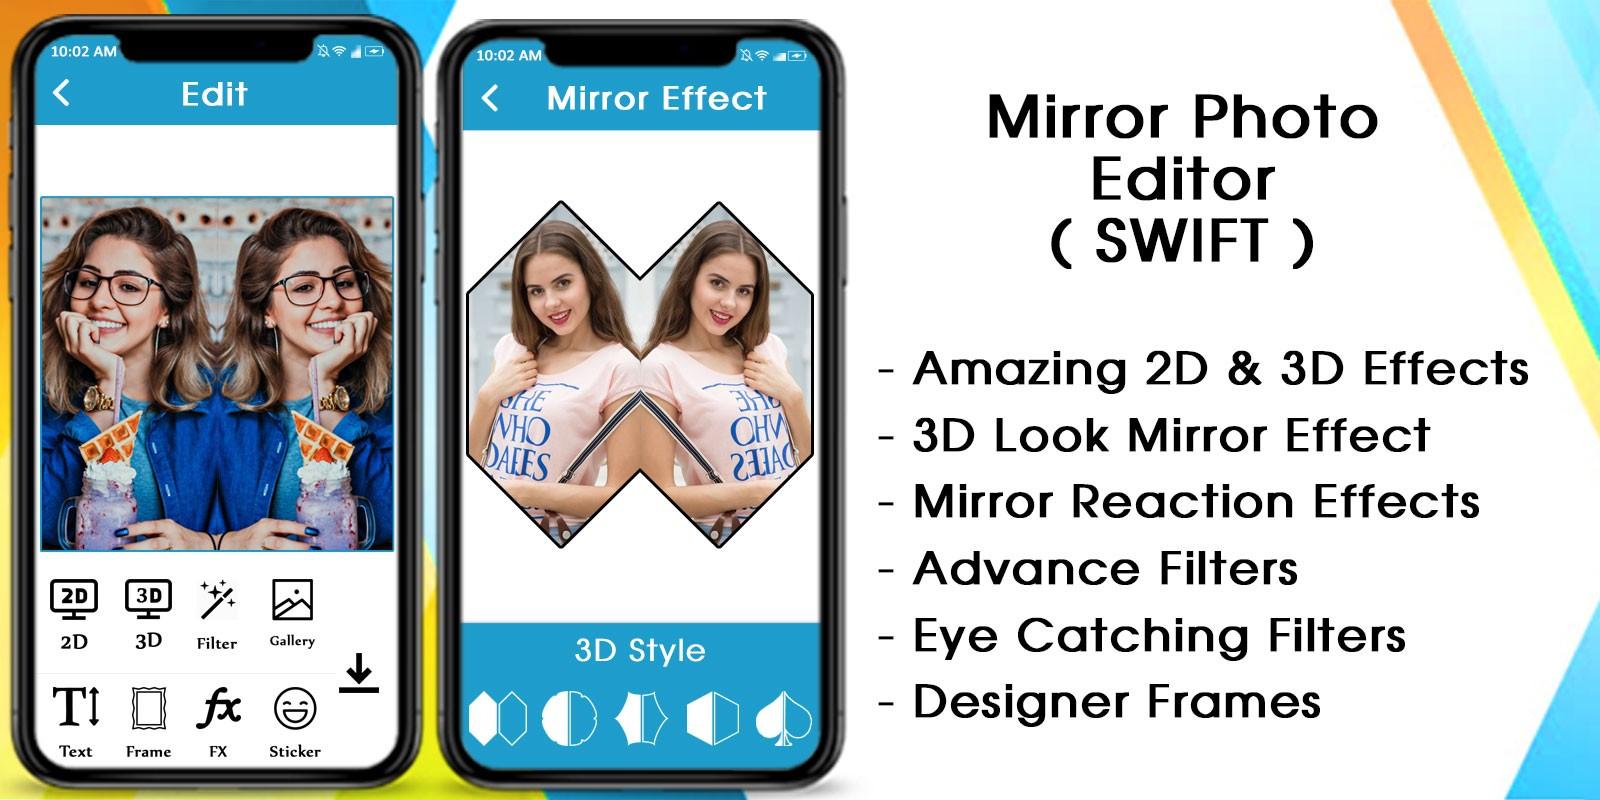 Mirror Photo - 3D MirrorPic Editor iOS Swift